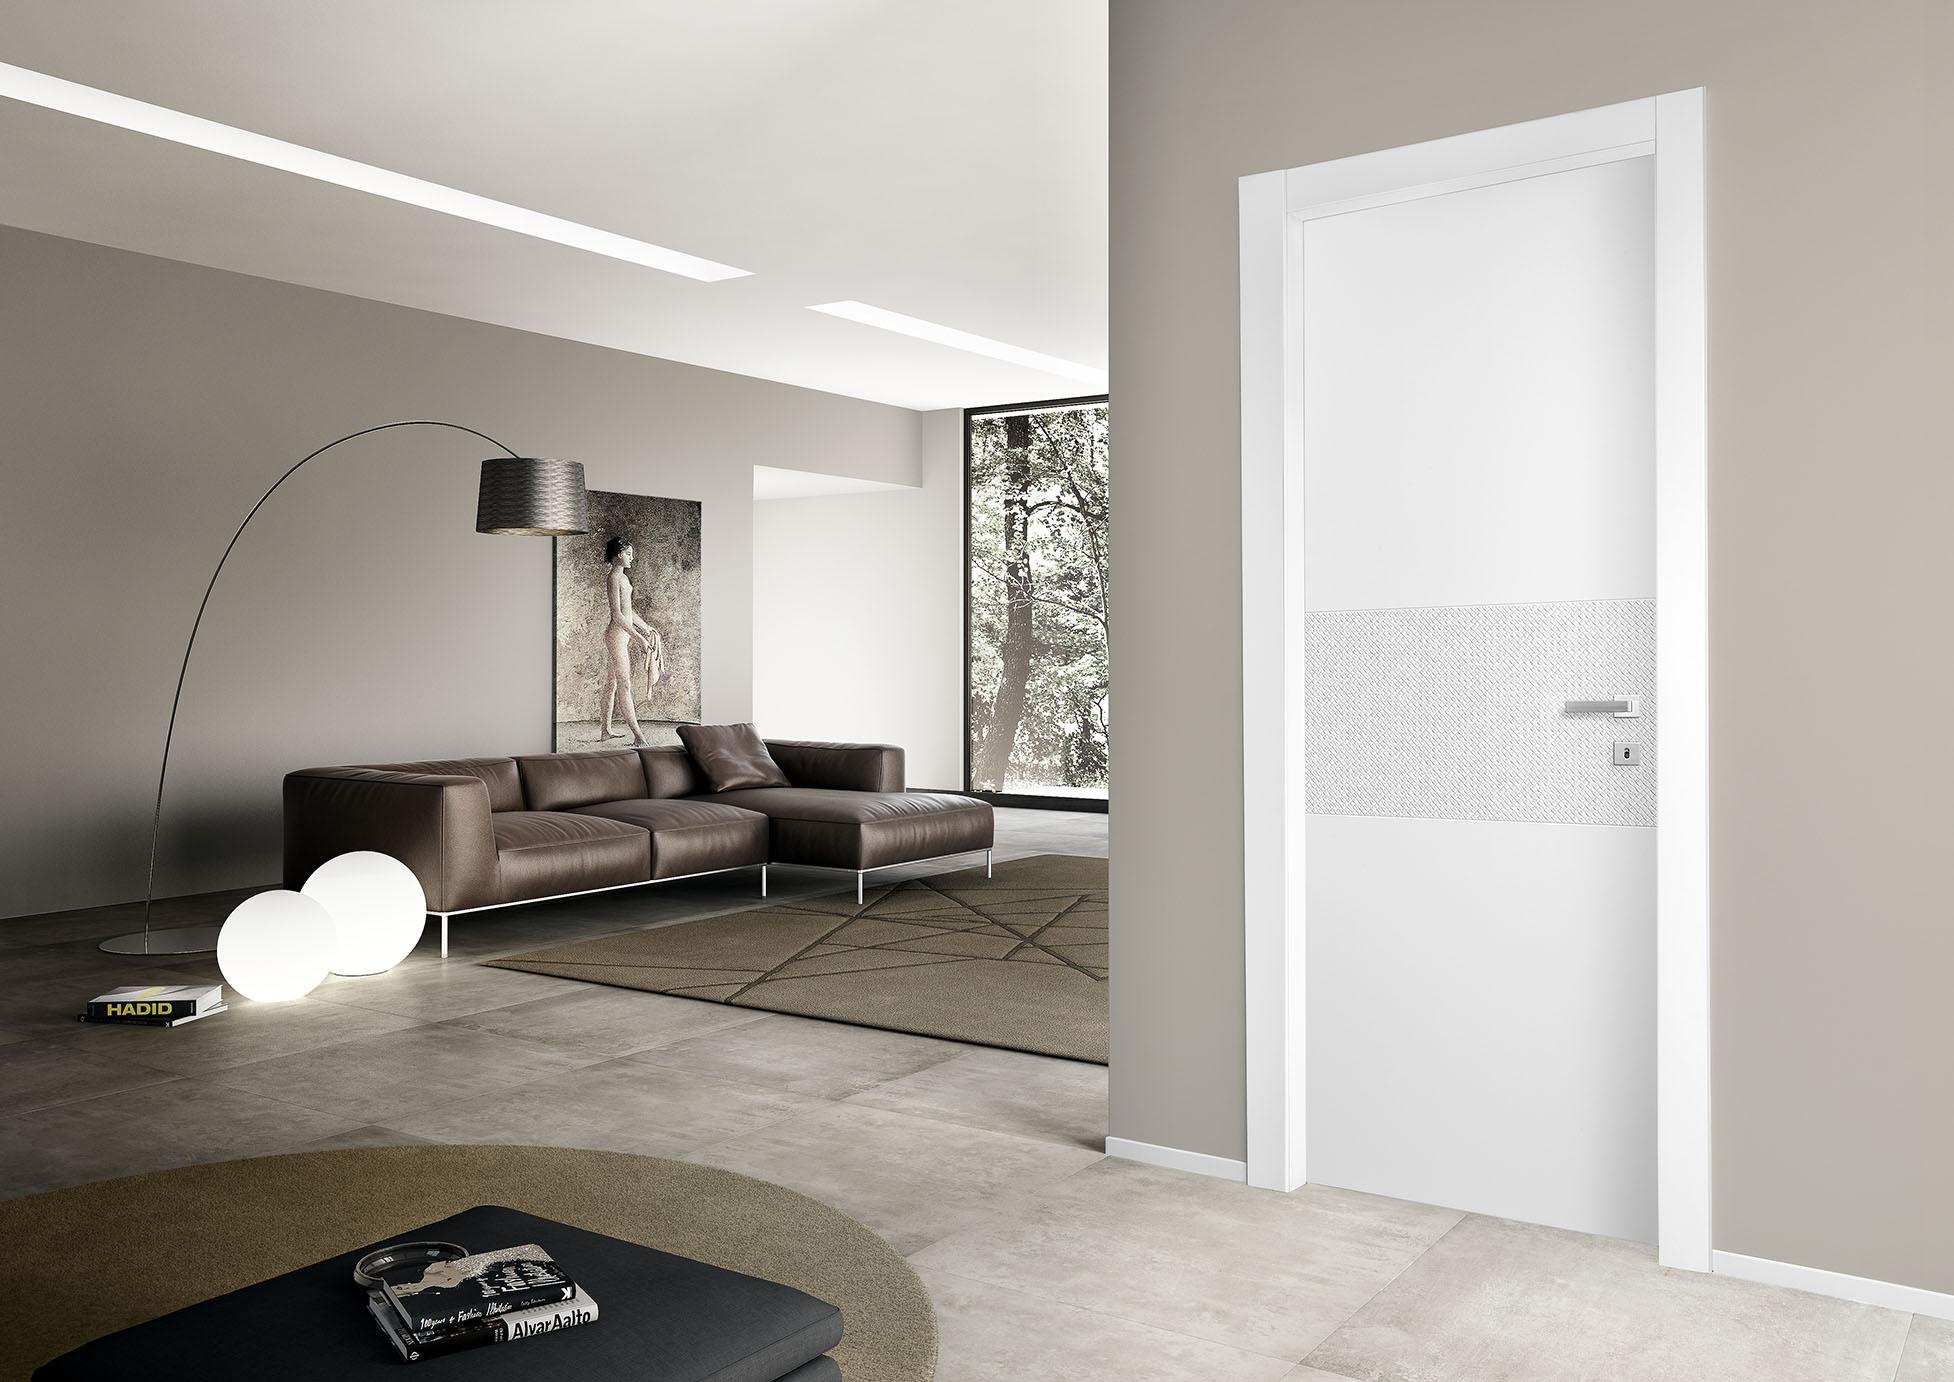 porte legno decorata bianca